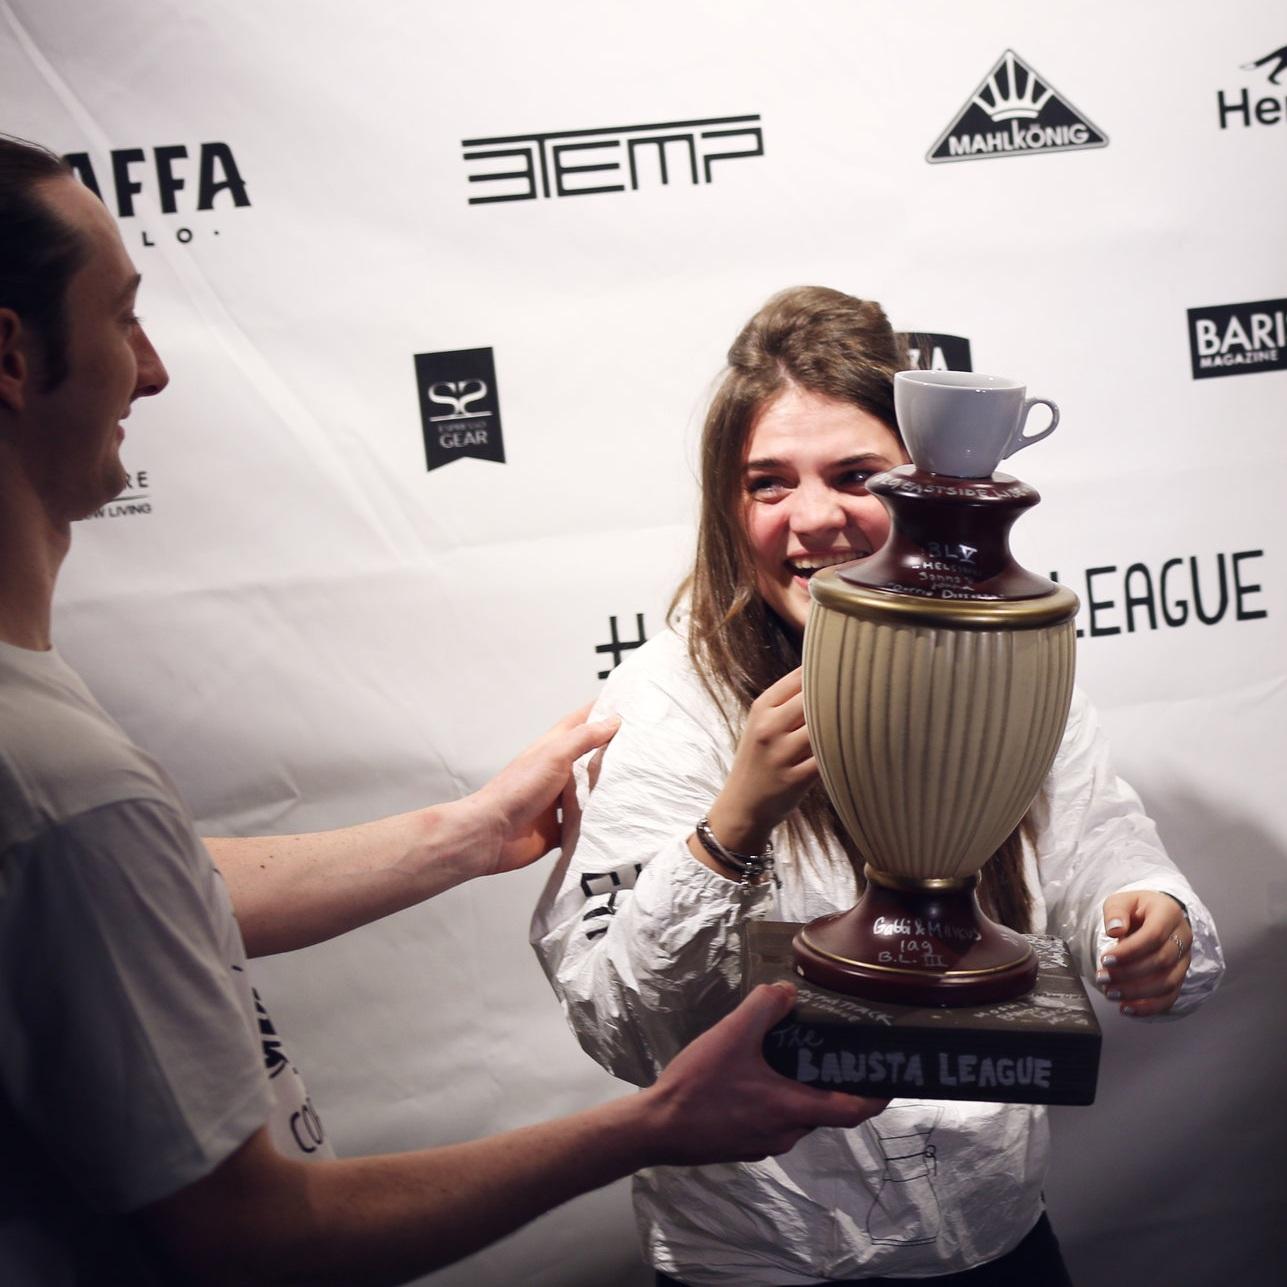 Irina Sharipova accepting her trophy at The Barista League: Copenhagen, 2017.